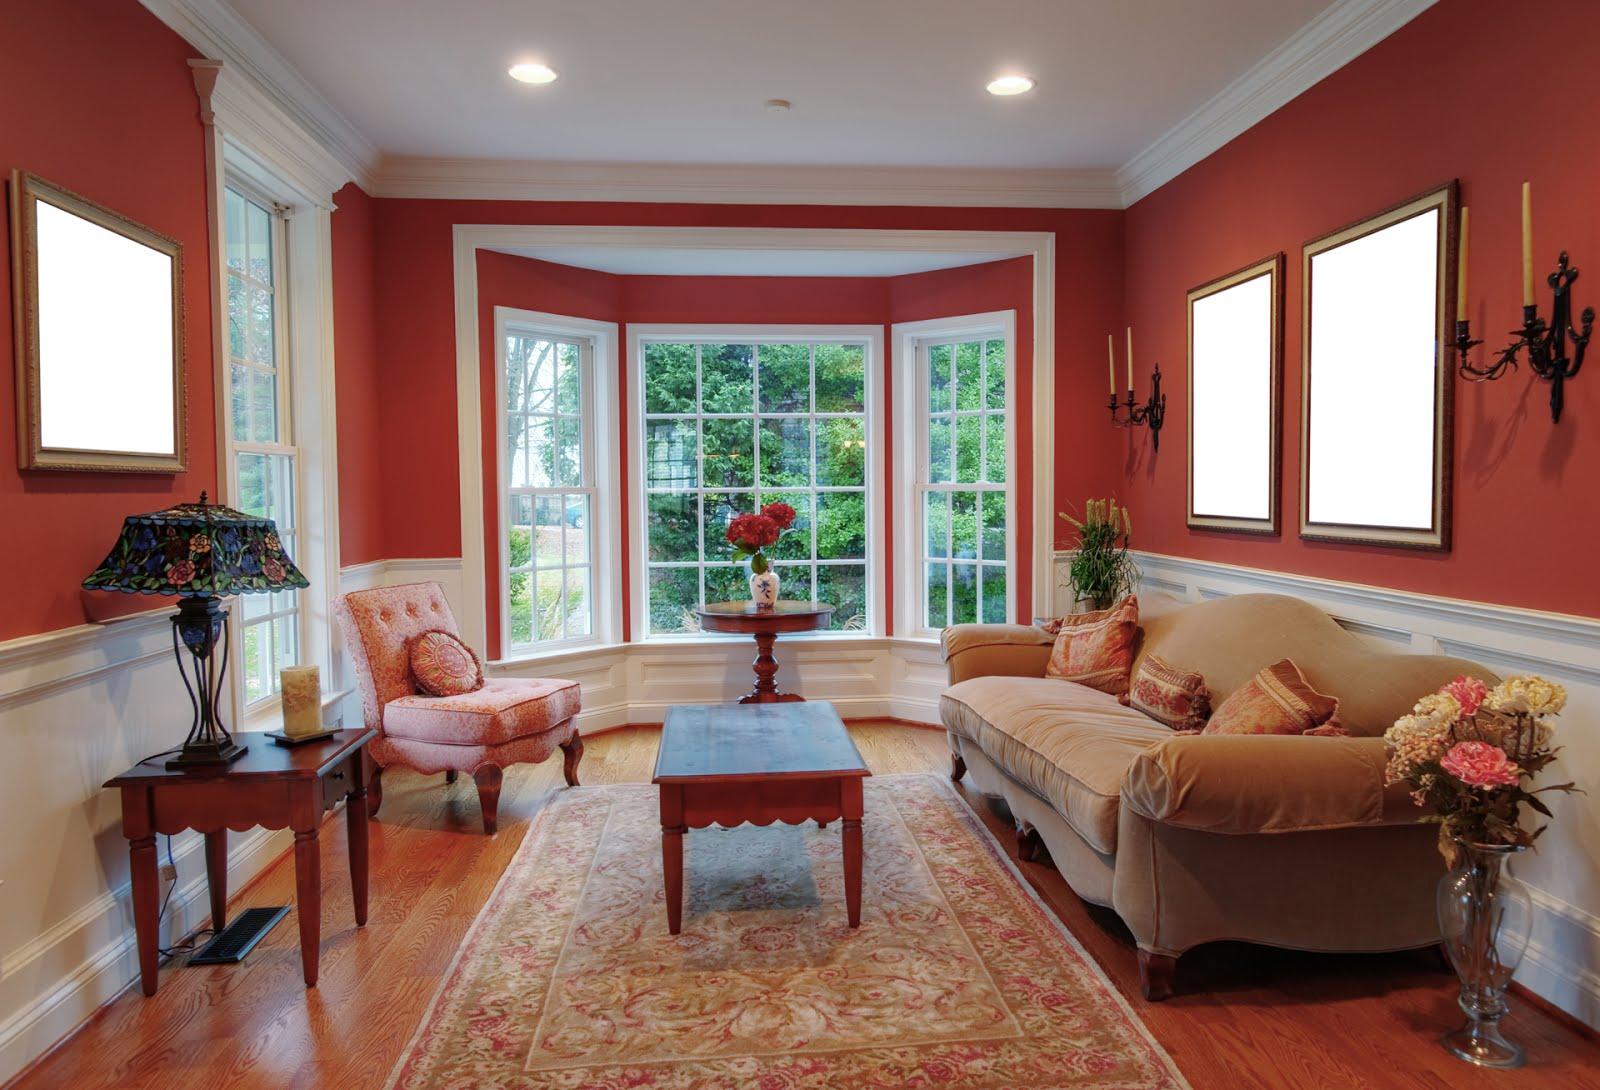 http://1.bp.blogspot.com/-p4OmSwG4stU/UQ6e_s3m-MI/AAAAAAABmWY/JfYxtU0cYHM/s1600/recamara-decoracion-y-dise%25C3%25B1o-interior-ideas-para-el-hogar-living-room.jpg